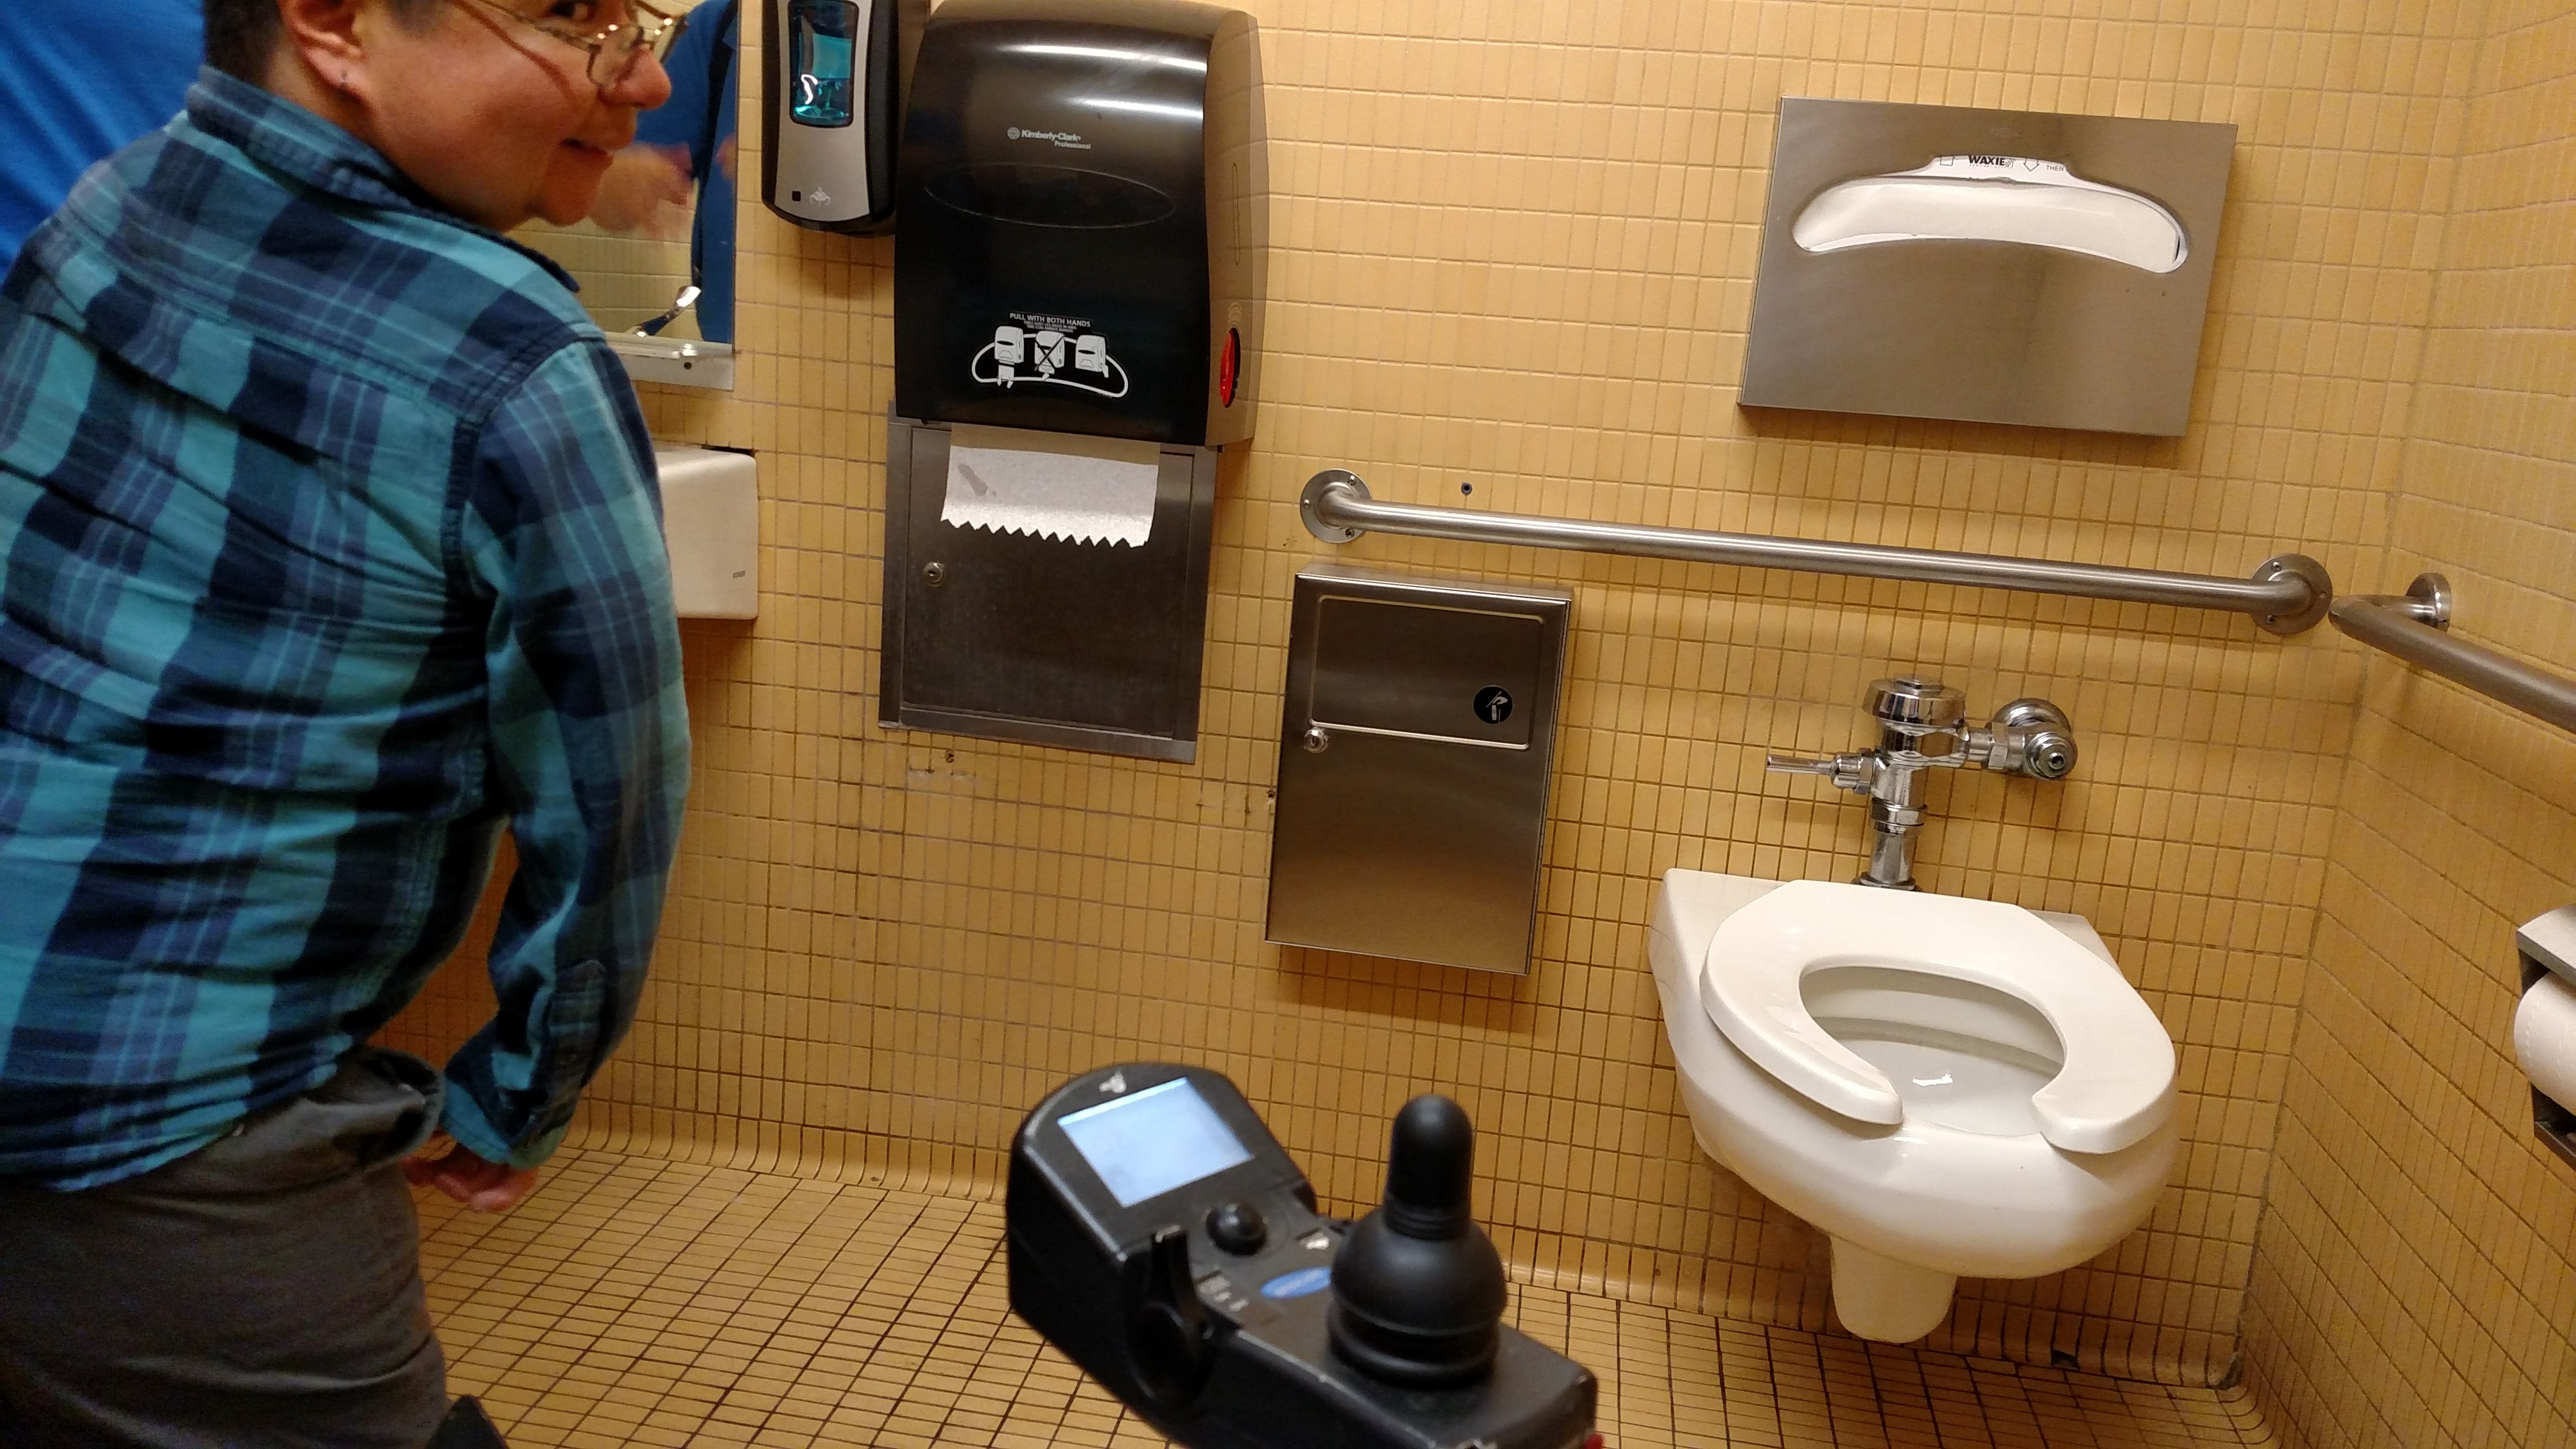 cir ranch virtual bath jose pala san d estate real master htm plumbing